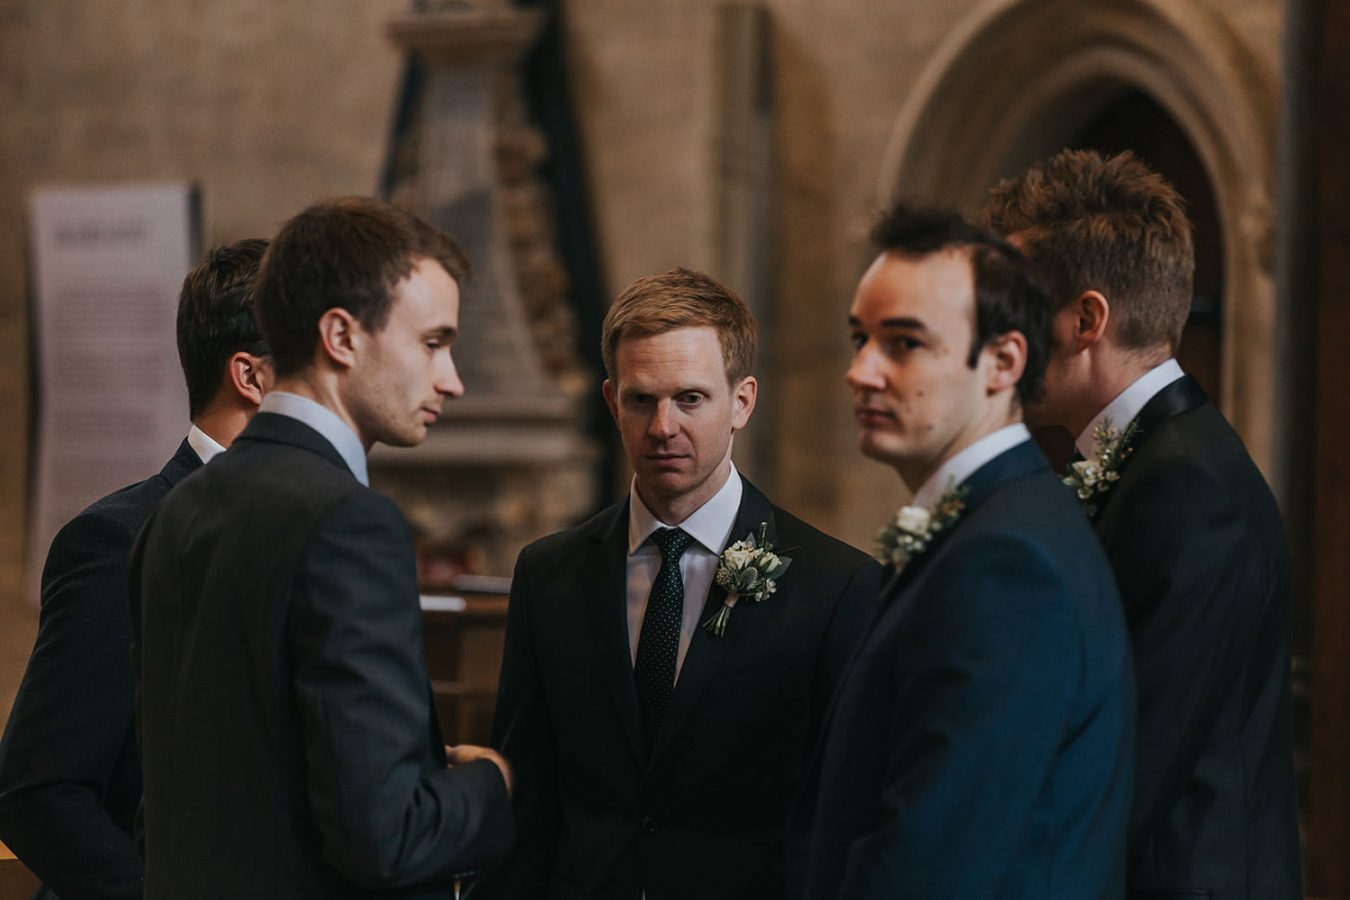 temple-church-london-wedding07